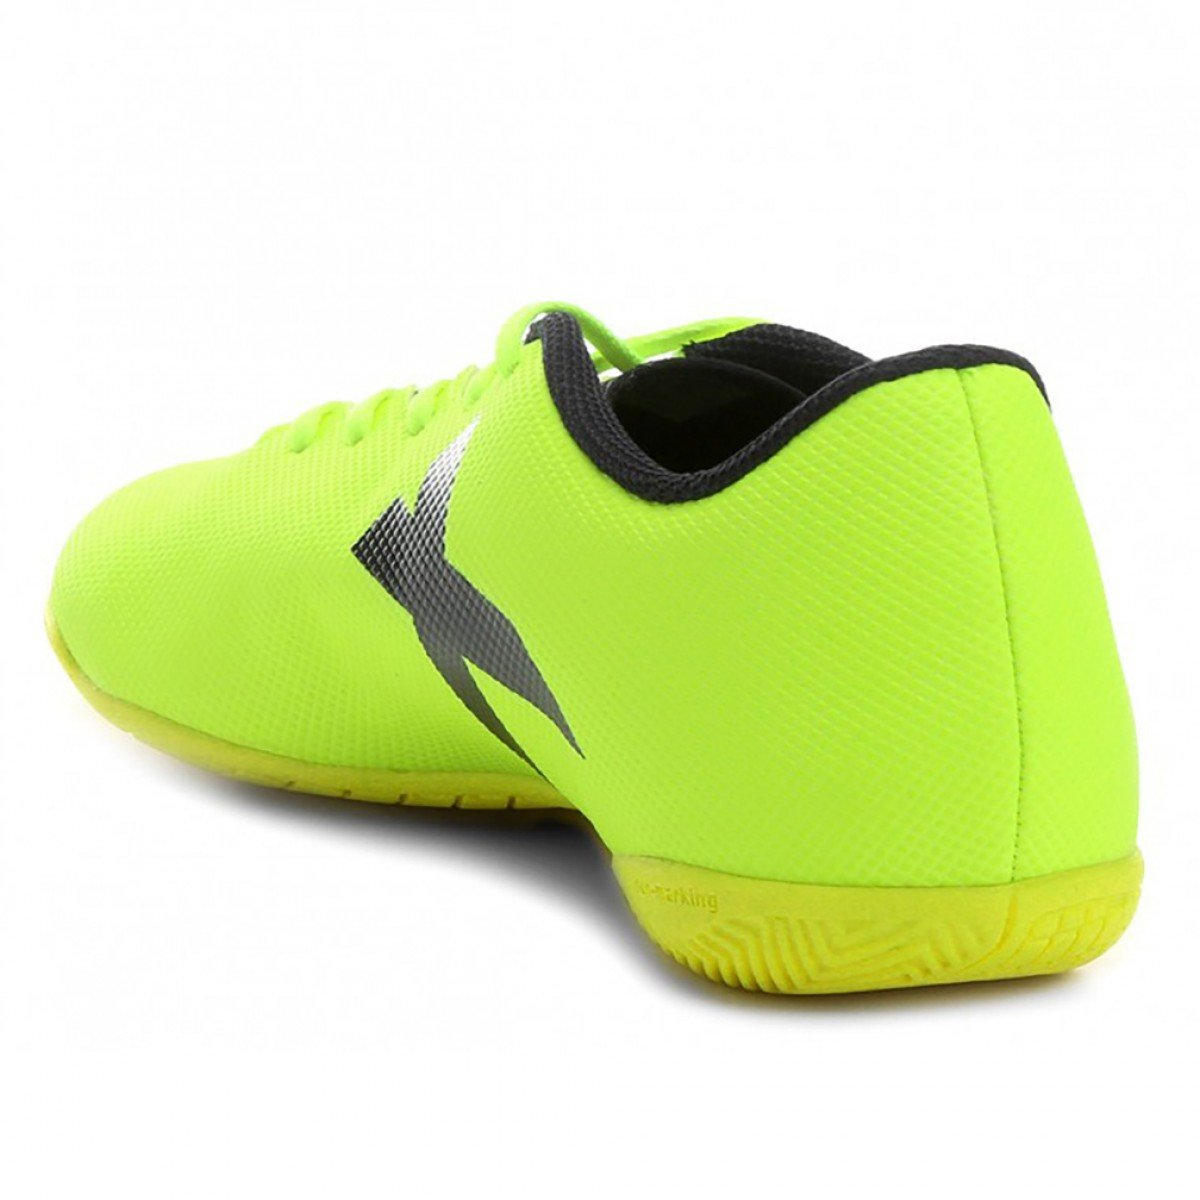 ... Chuteira Futsal Adidas X 17.4 IN Masculina - Verde Limão ... b7c7574f0d5fc